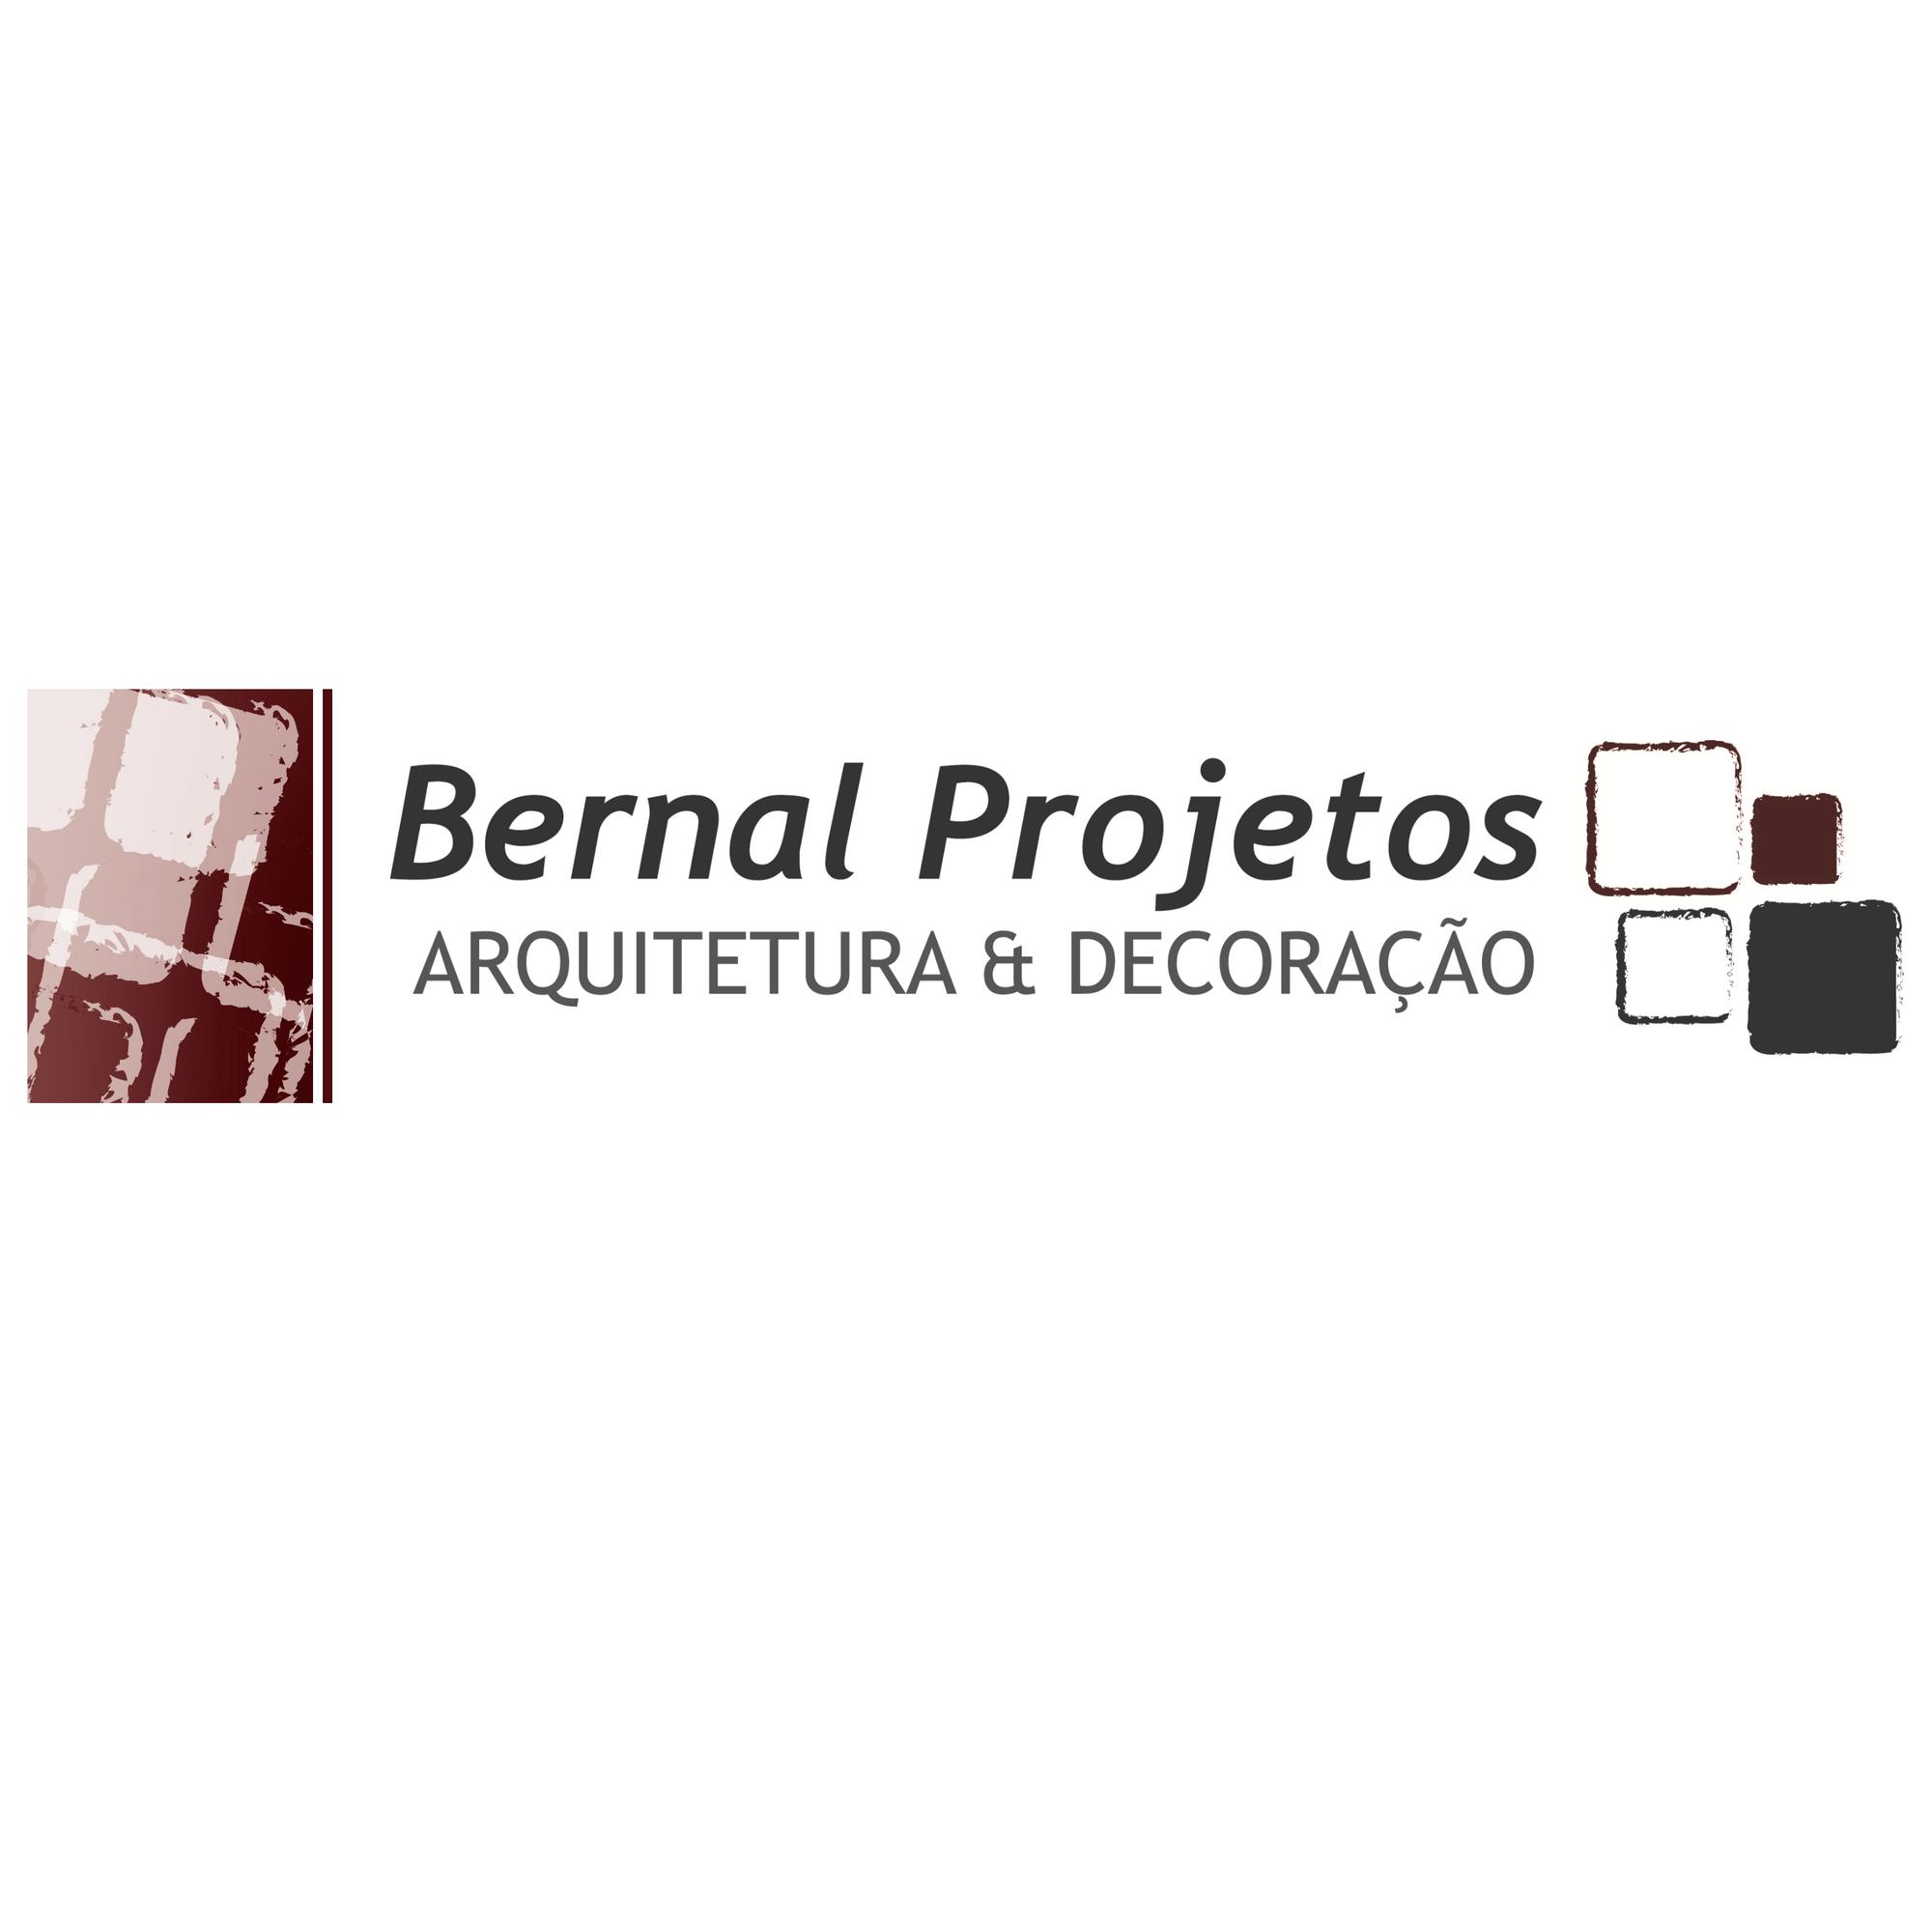 Conheça a Bernal Projetos